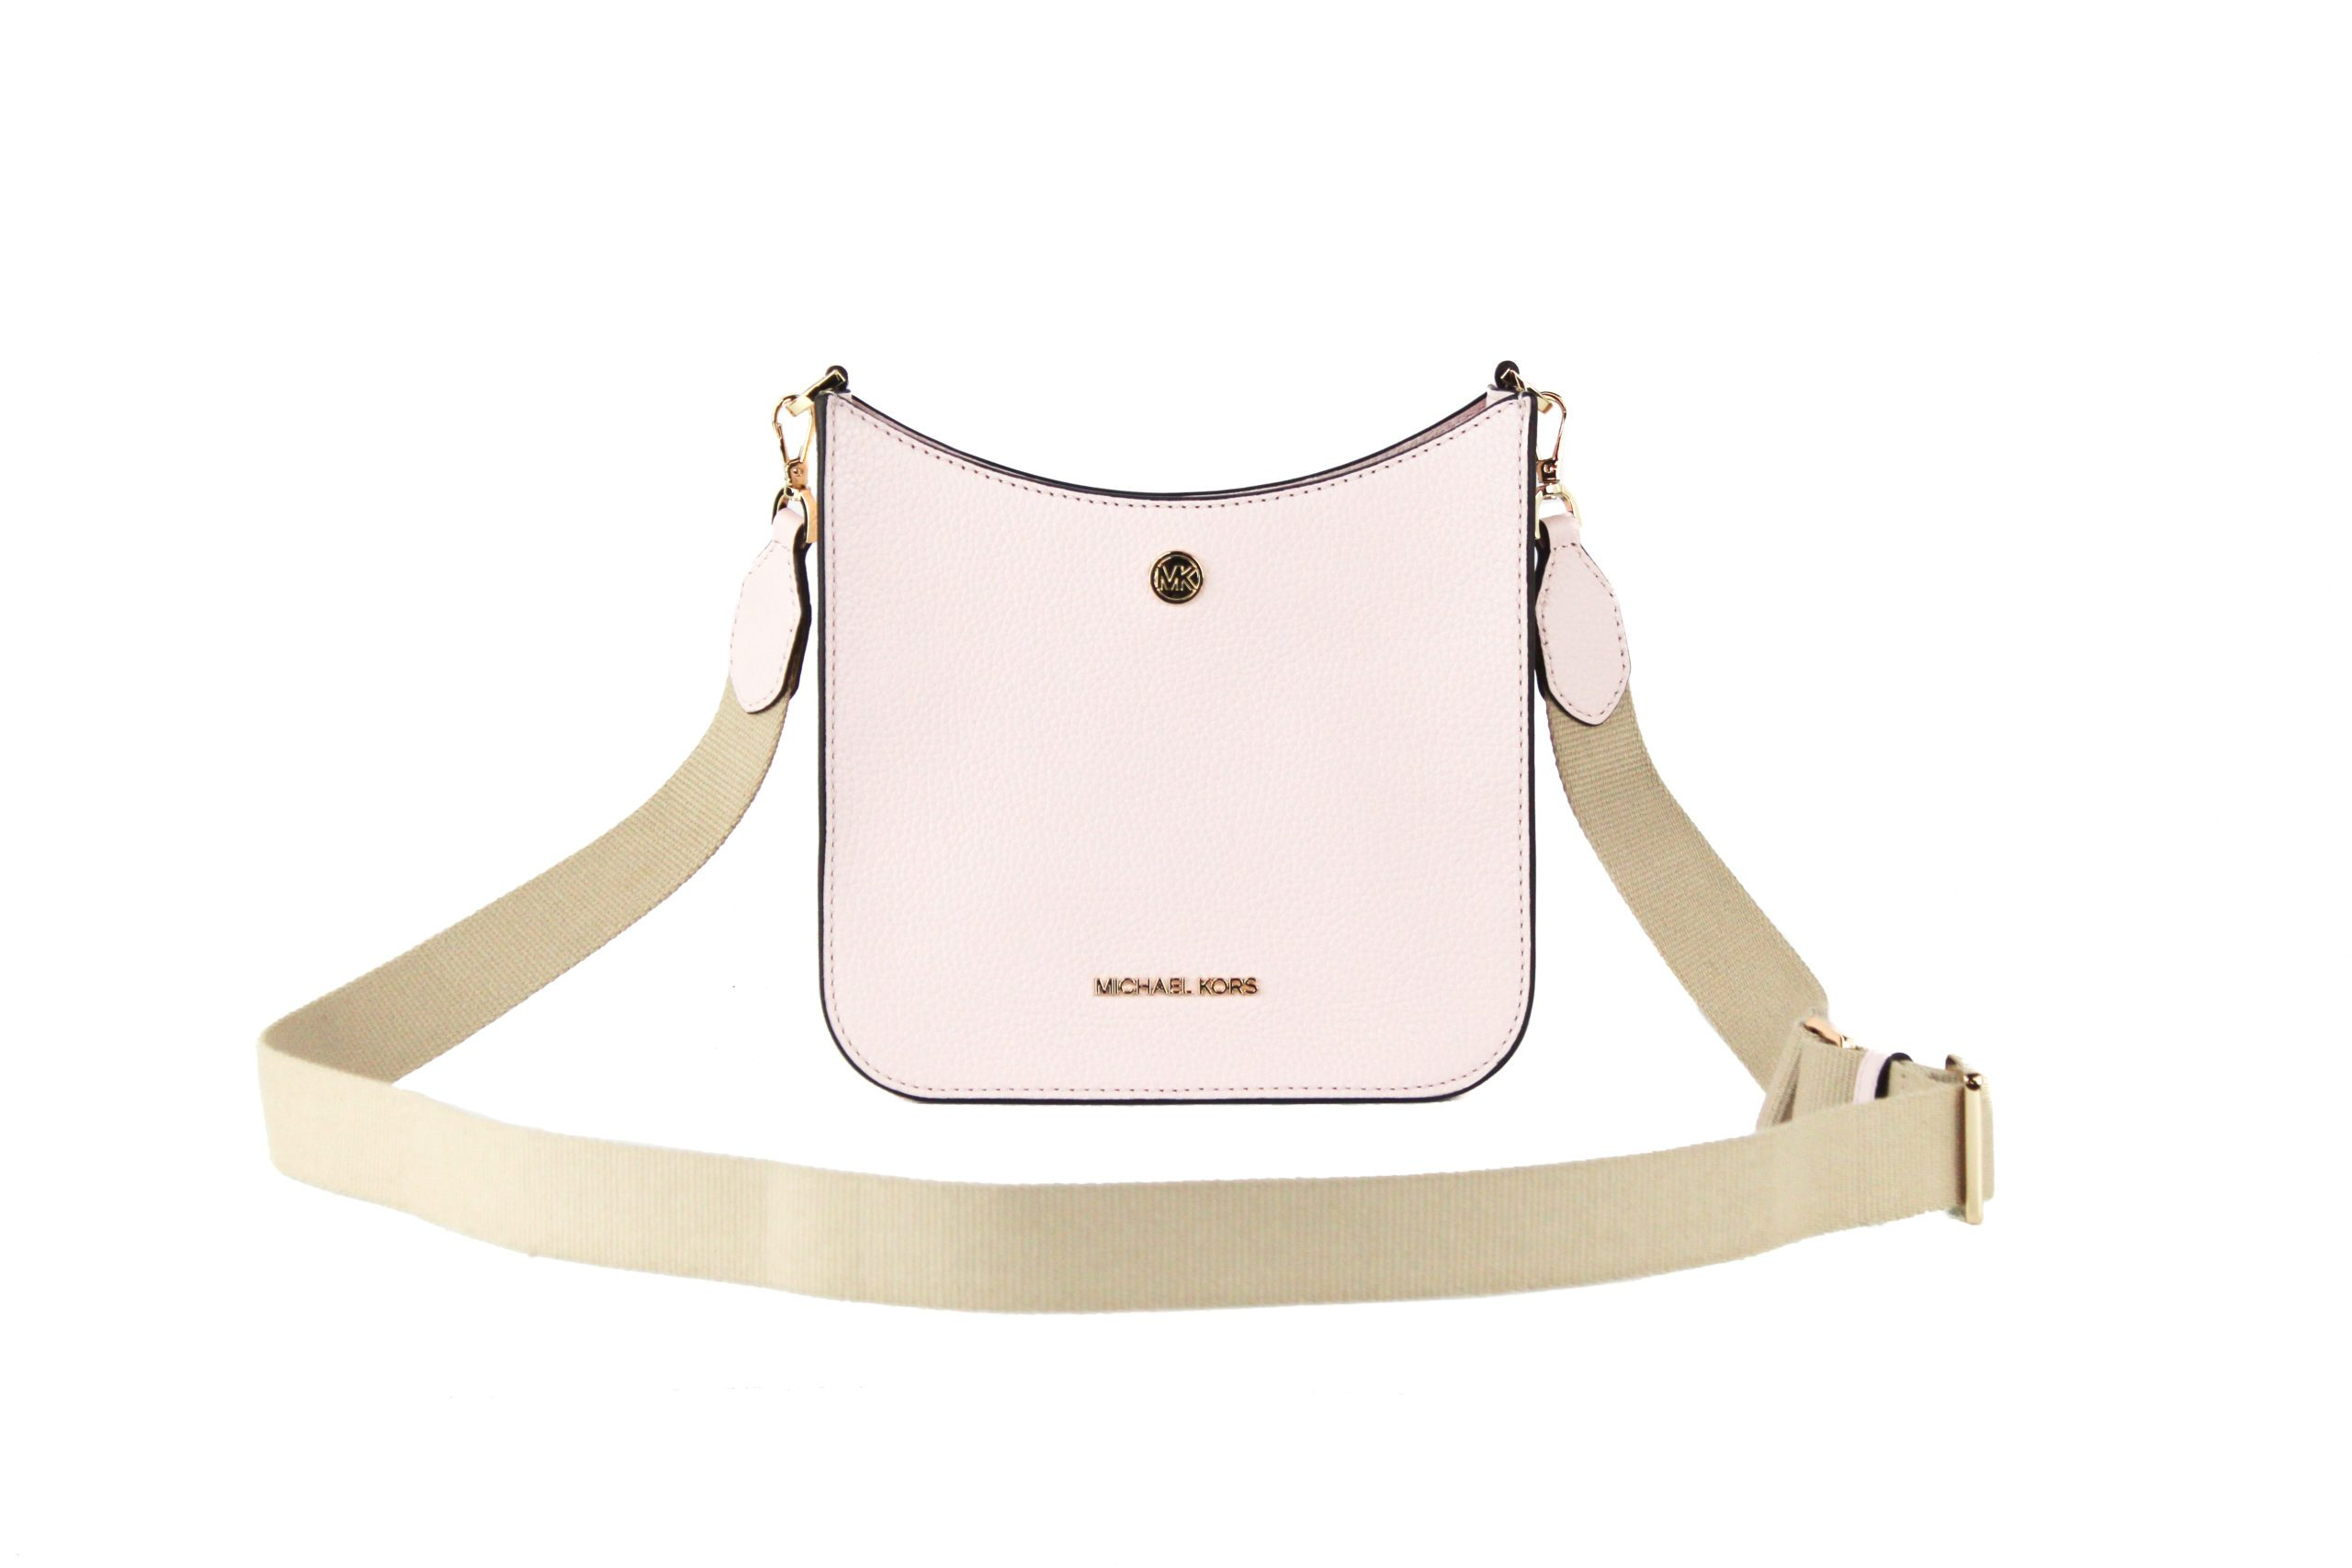 Michael Kors Women's Briley Bag Pink 87323